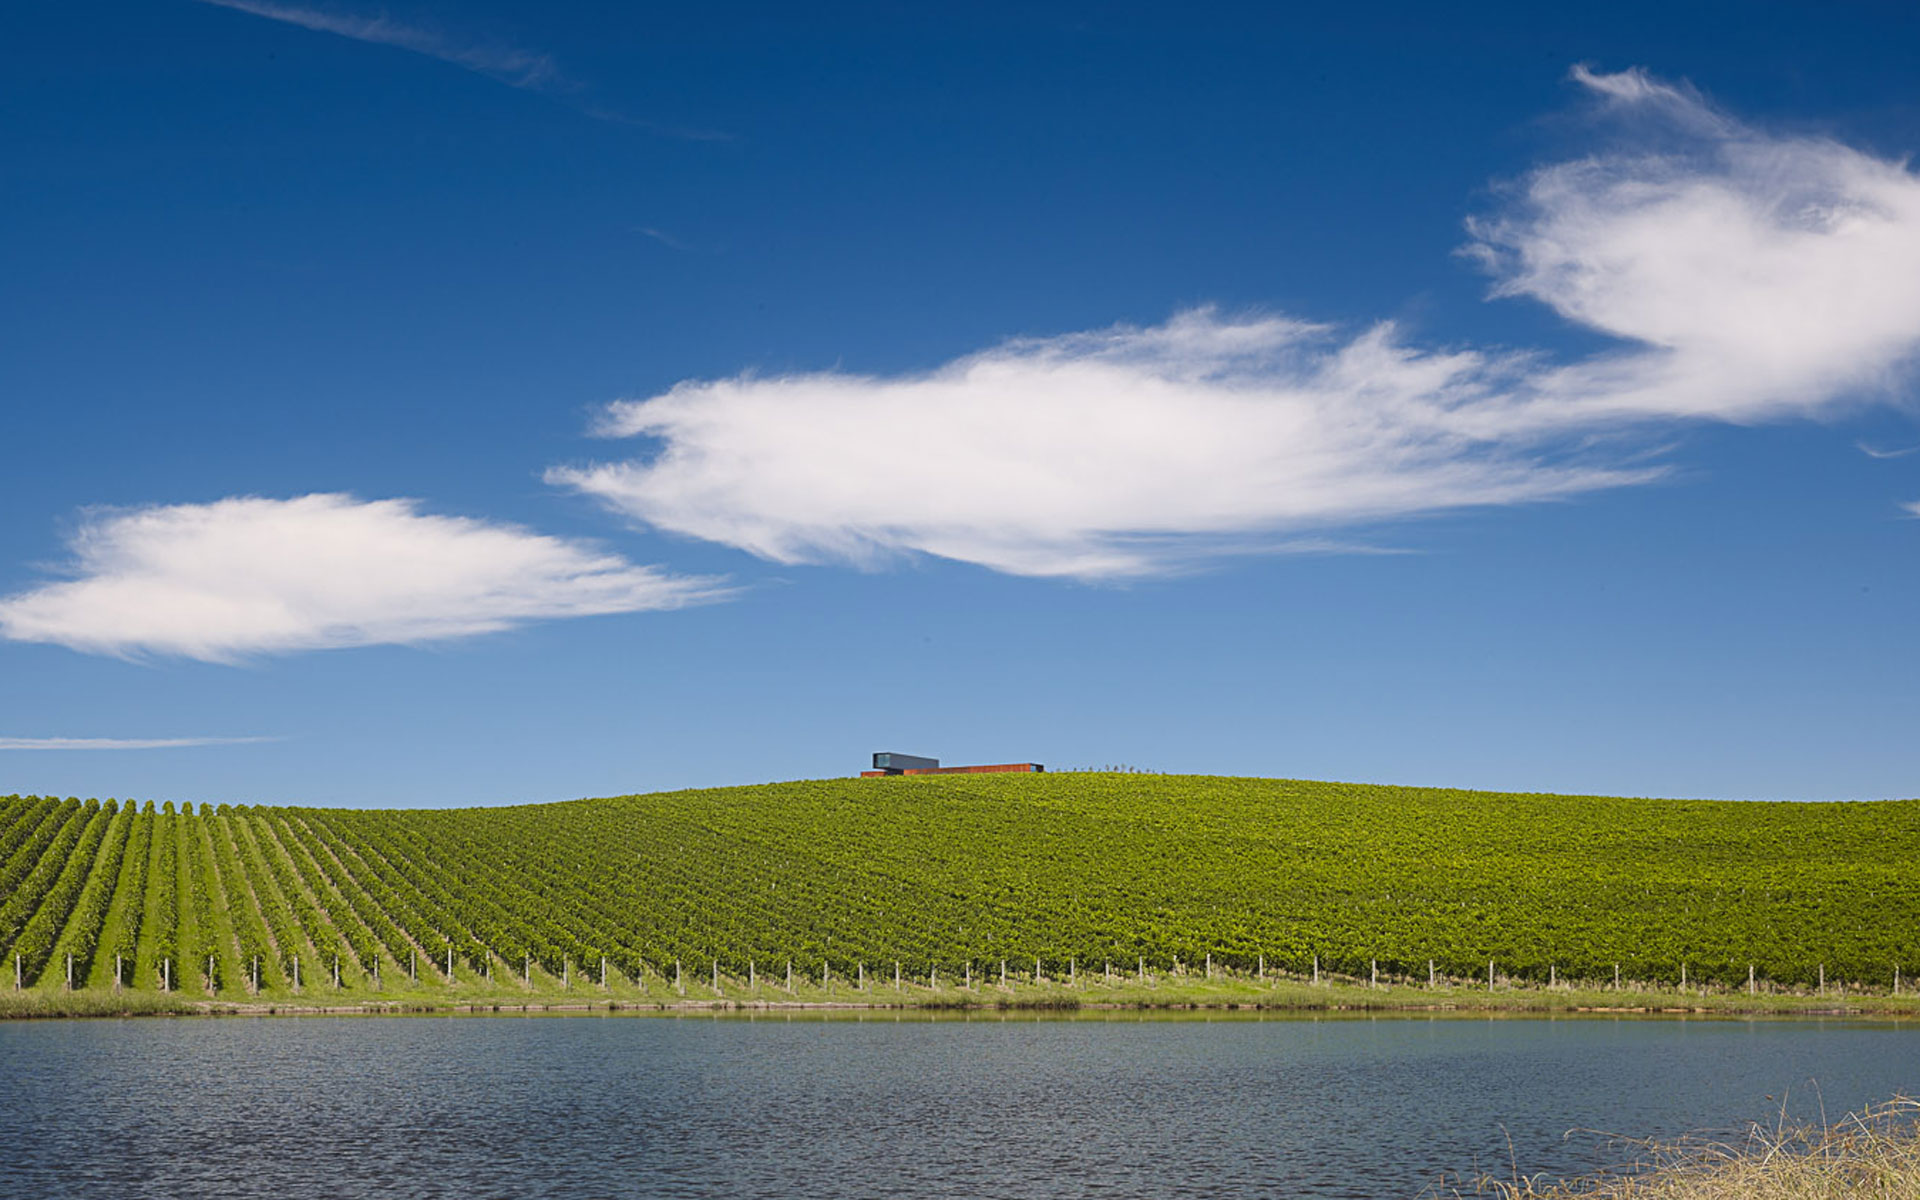 View Hill House + Vineyard, Yarra Valley, Victoria, Australia